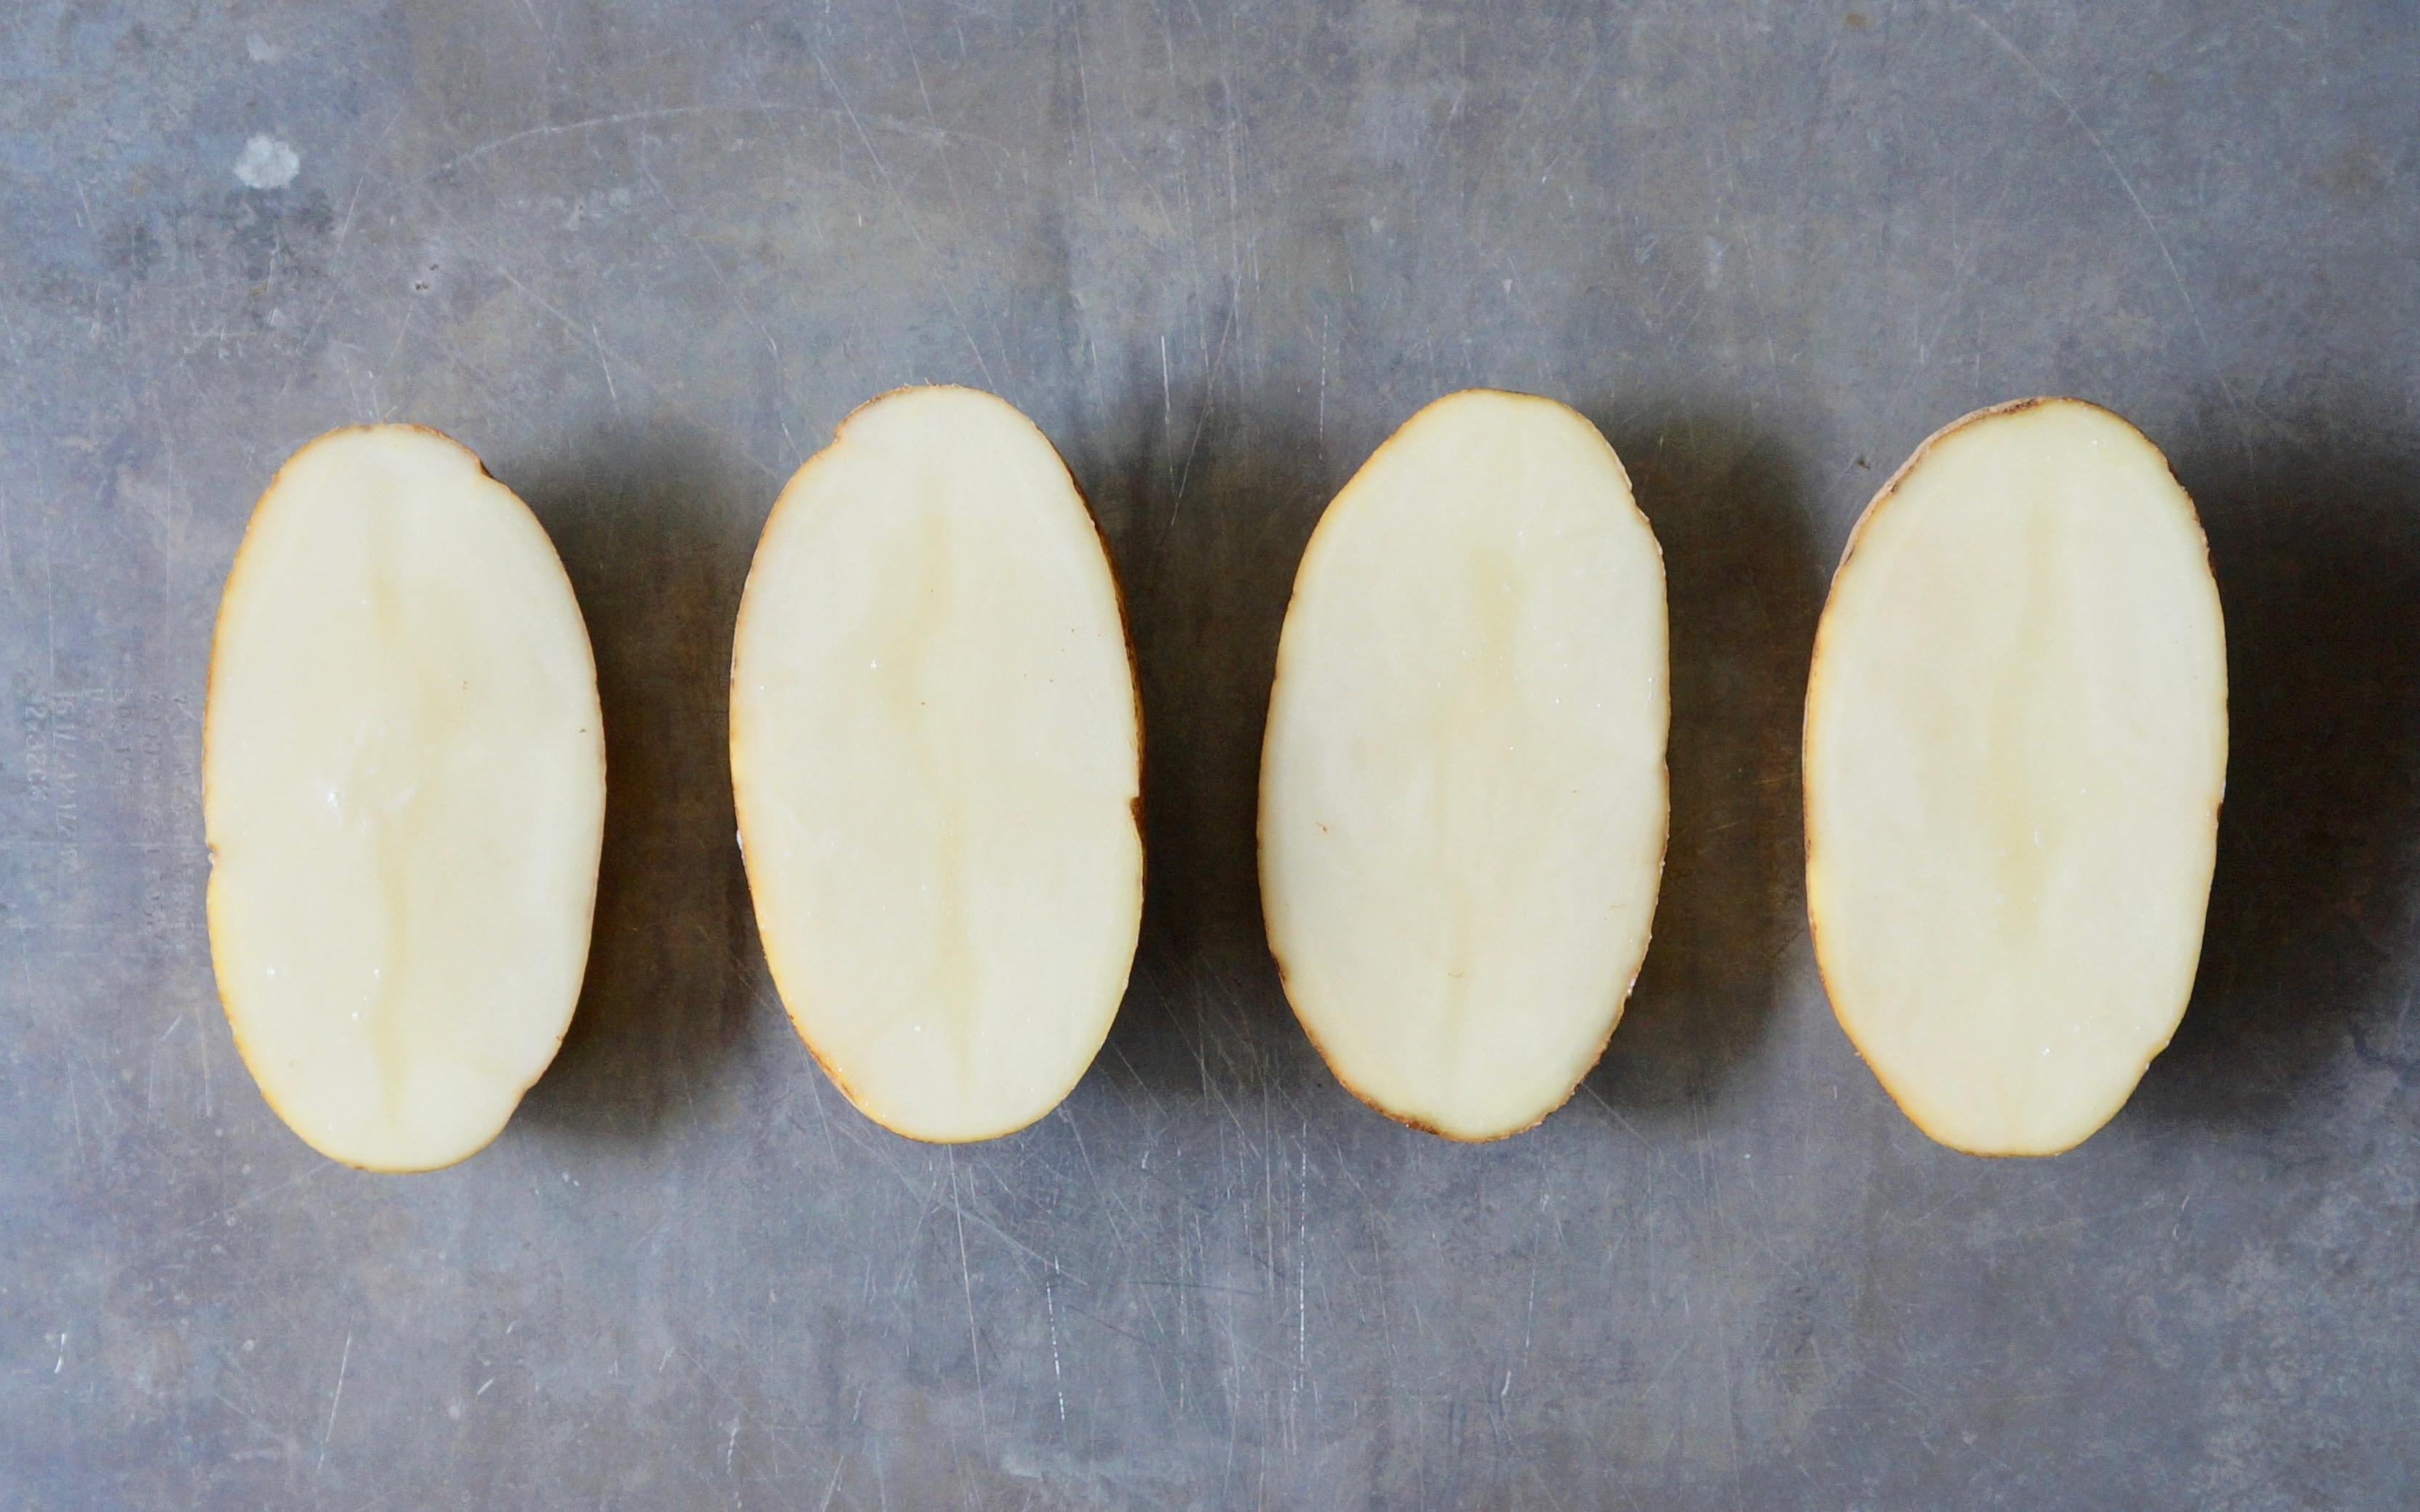 Grilled Potatoes With Sour Cream-Rebecca-Gordon-Publisher-Buttermilk-Lipstick-Culinary-Entertaining-Techniques-Southern-Hostess-RebeccaGordon-Pastry-Chef-Birmingham-Alabama